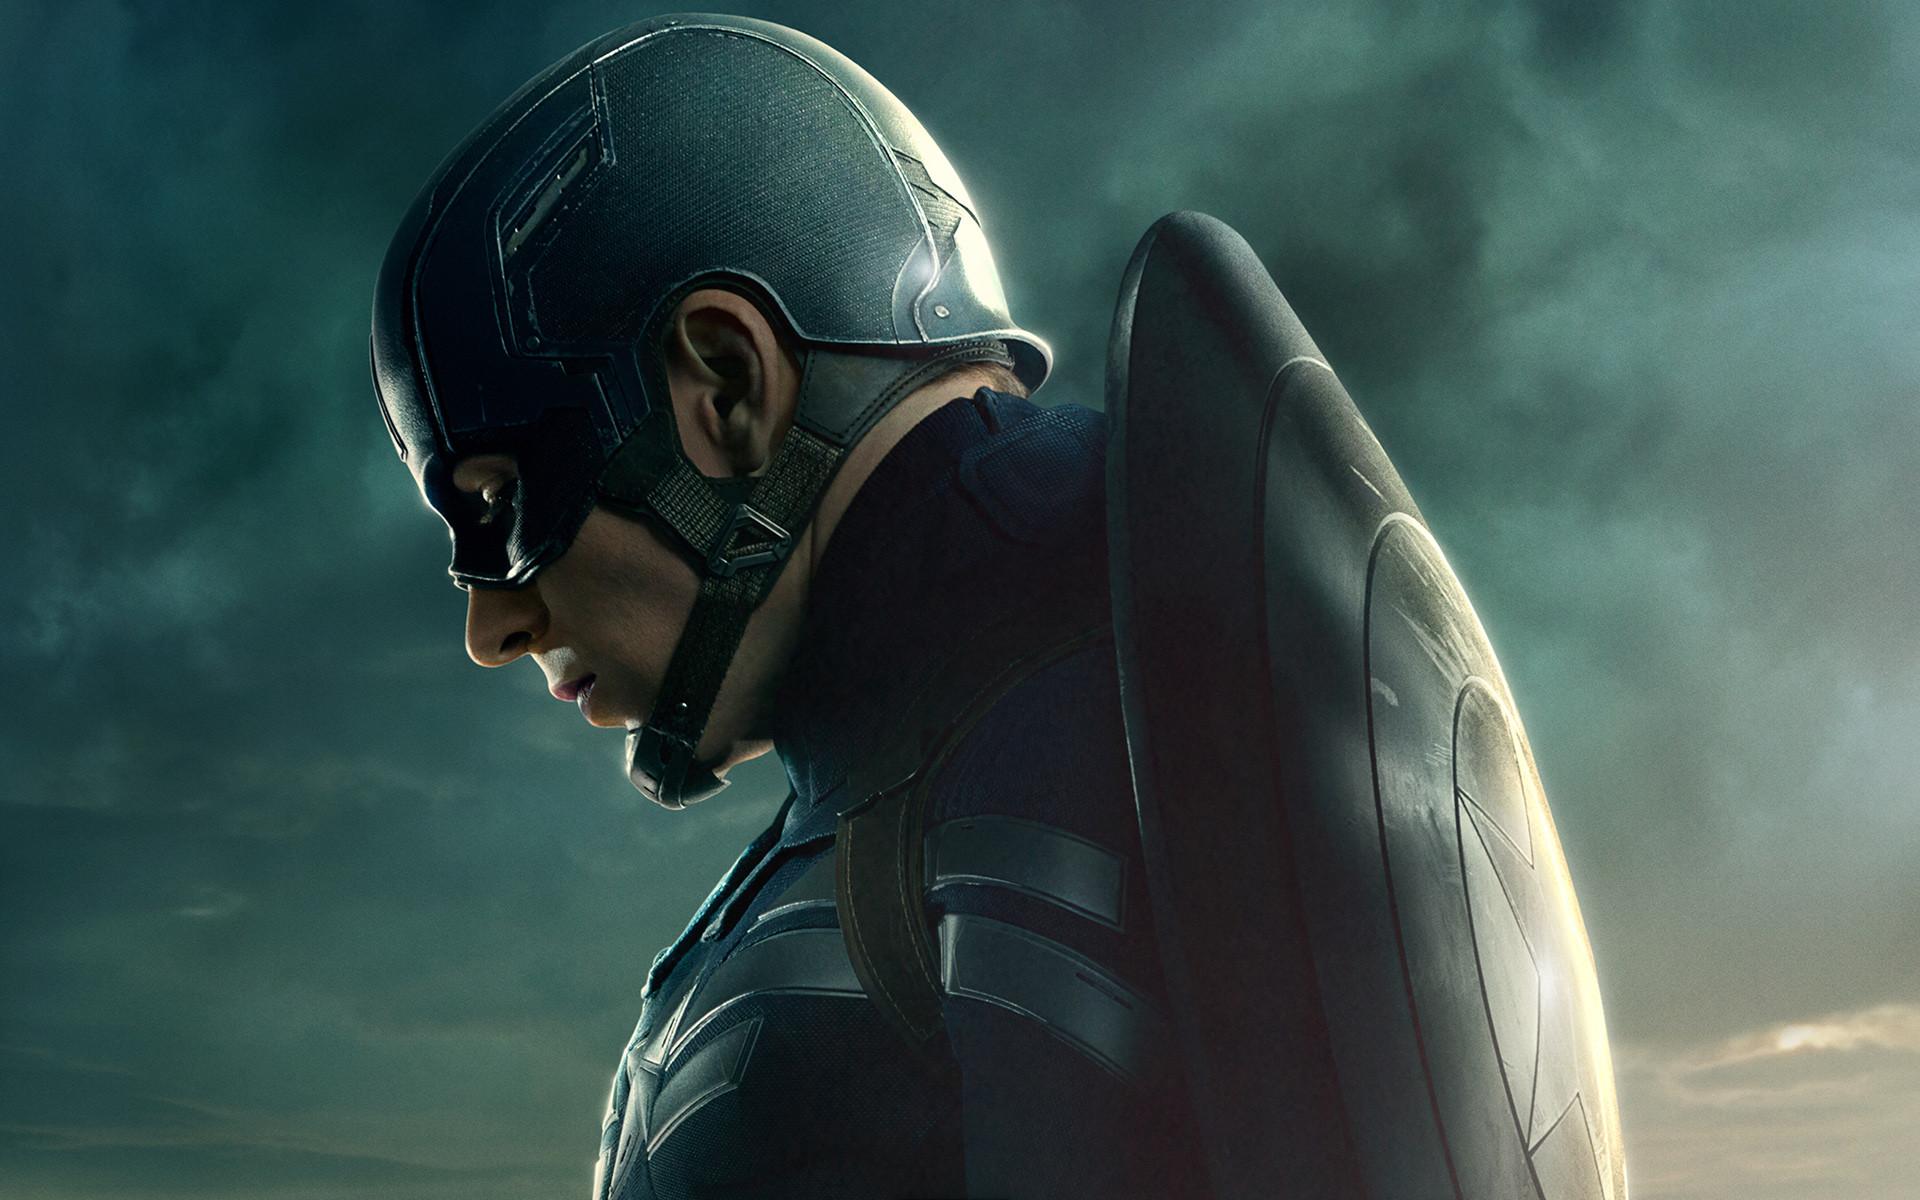 films #captain america 2 #captian #poster film#heroes #wallpaper hd #